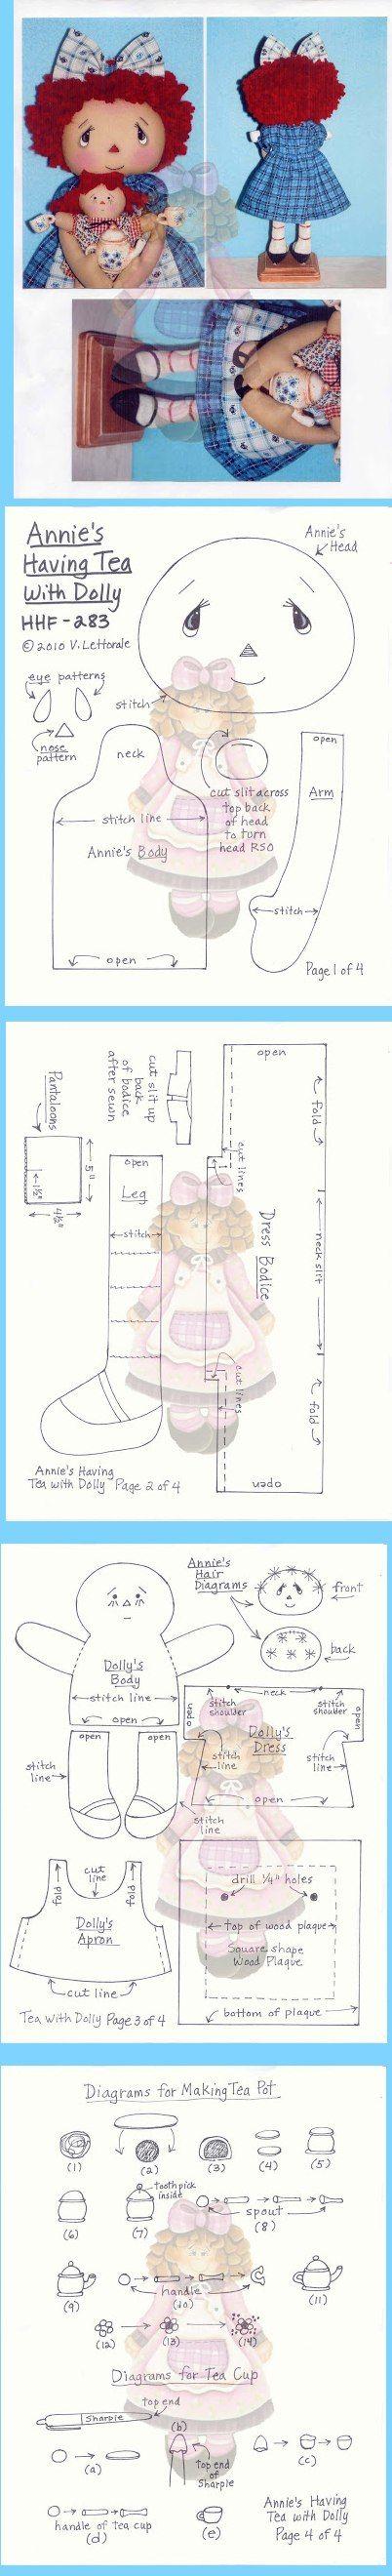 rag doll pattern ....Nims.... http://www.li.ru/interface/pda/?jid=3851608&pid=162189278&redirected=1&page=0&backurl=/users/3851608/post162189278/